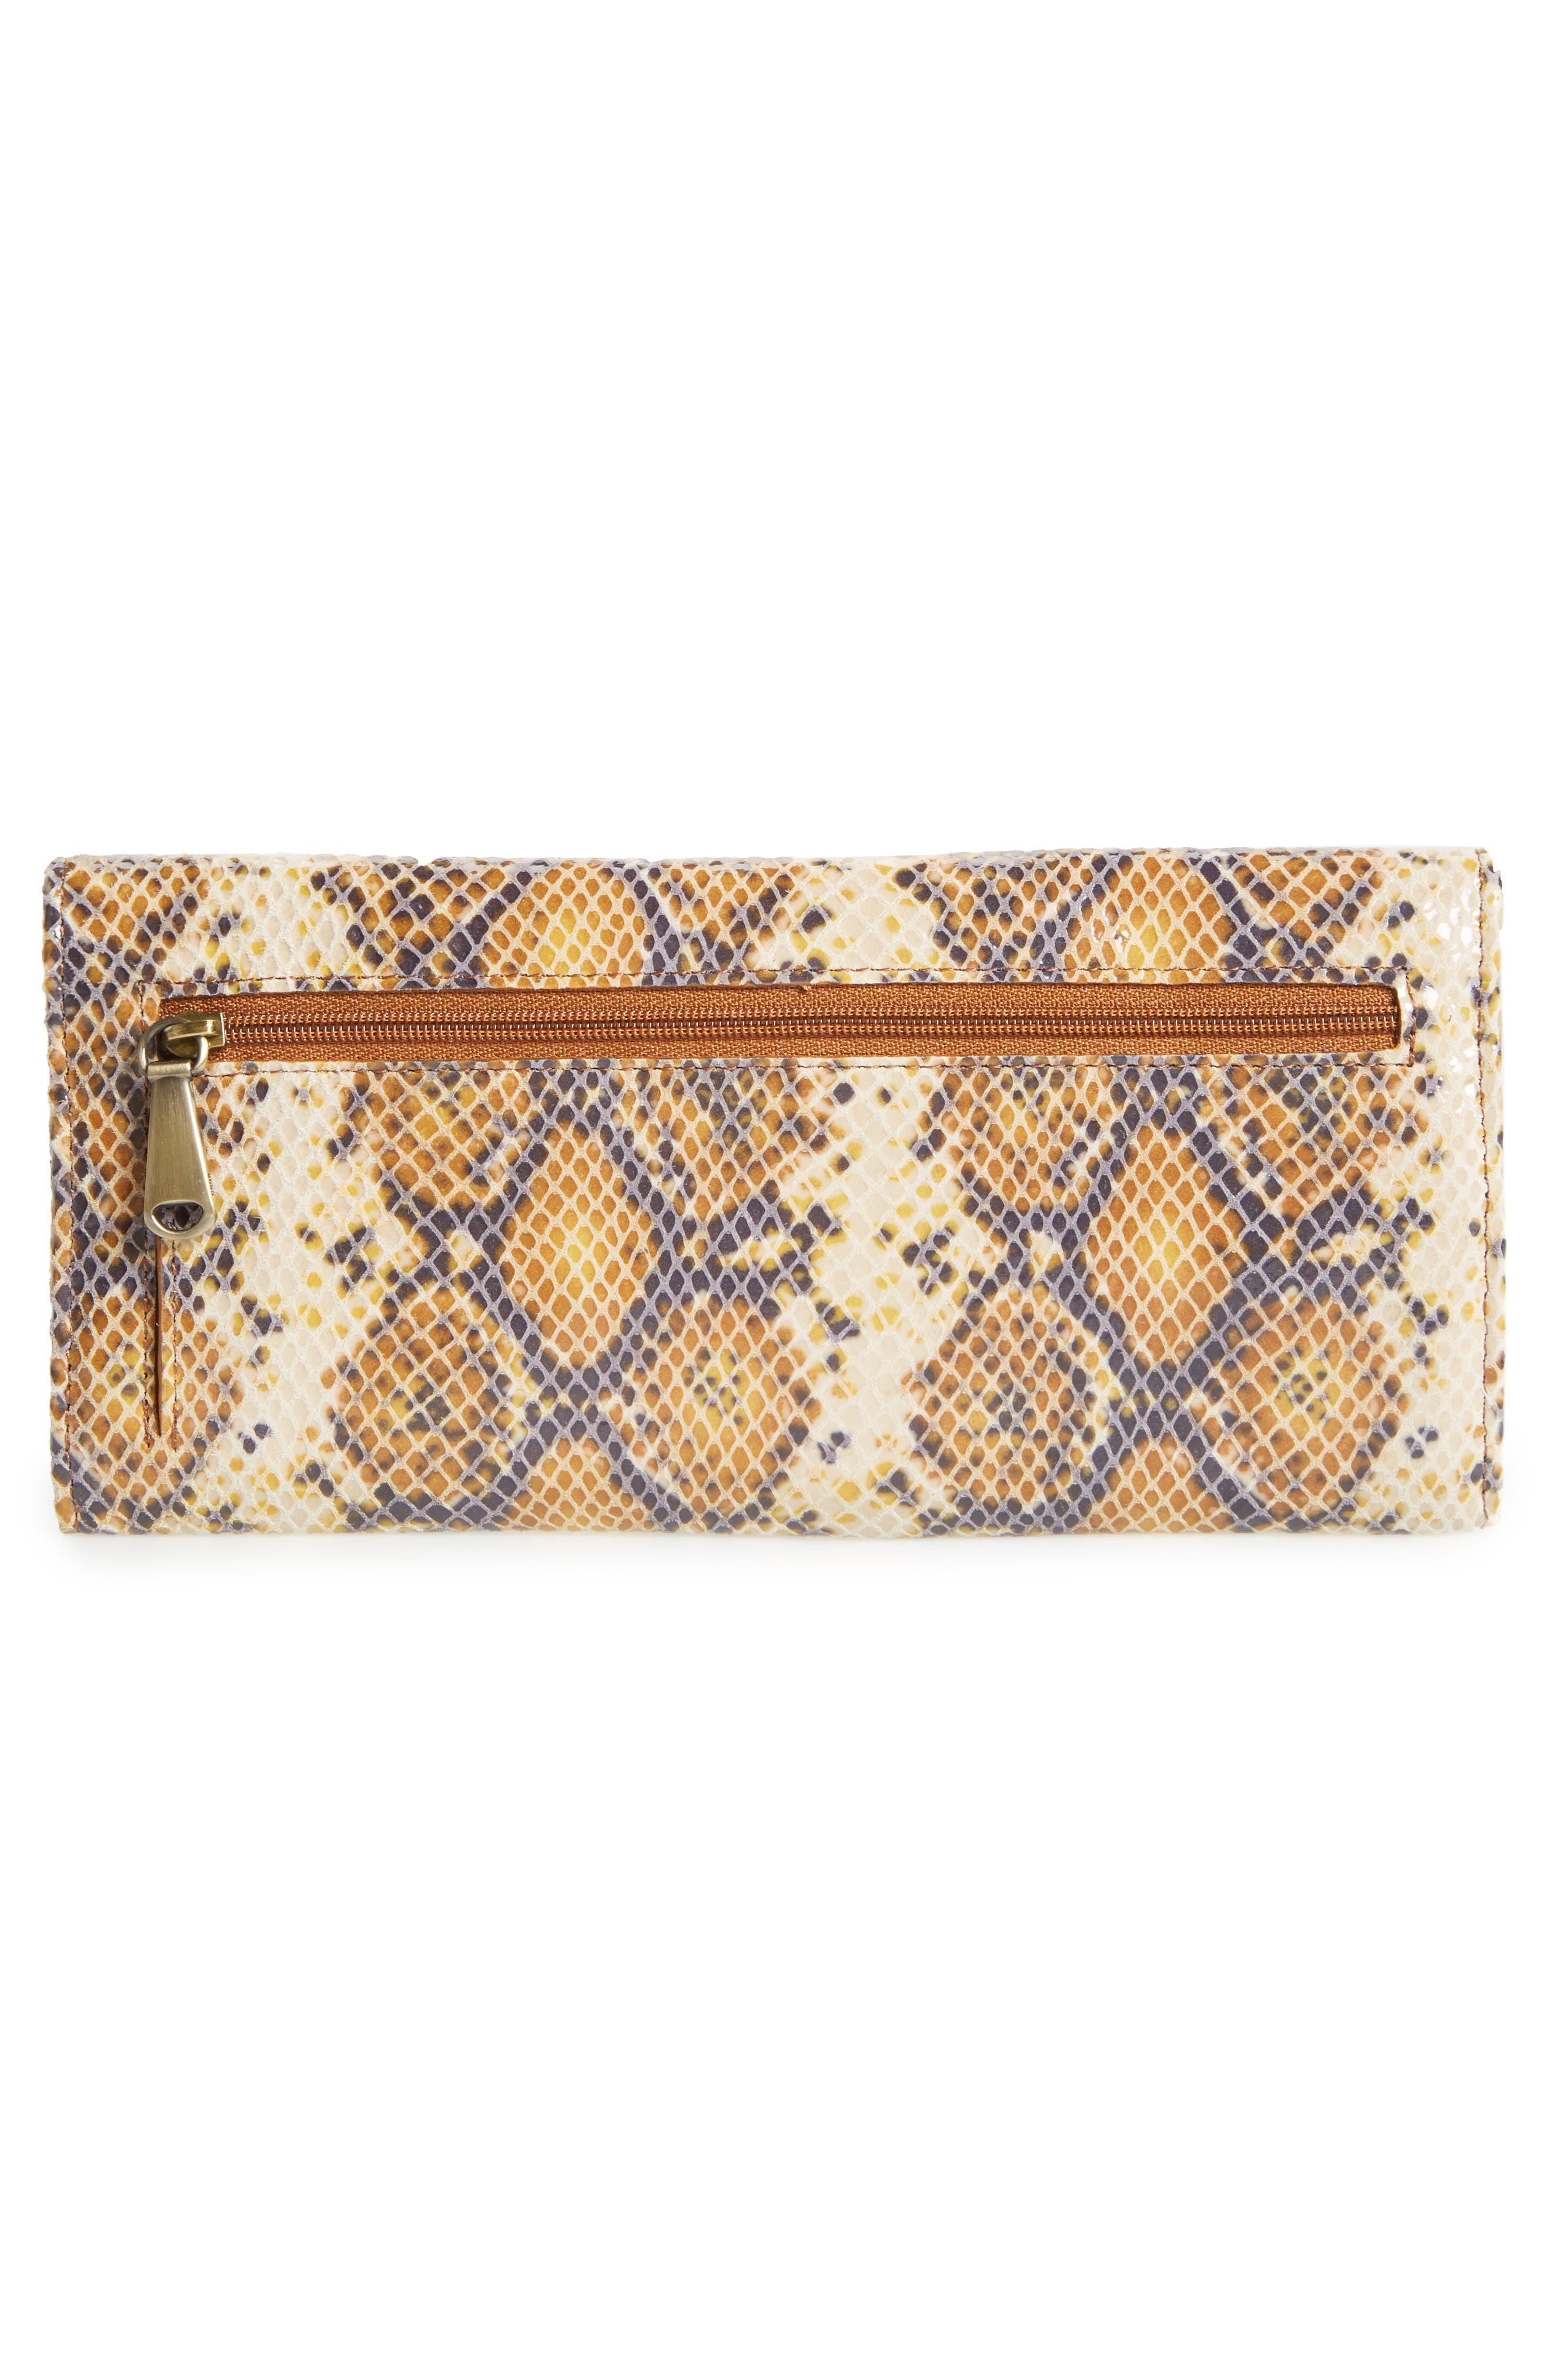 'Sadie' Leather Wallet,                             Alternate thumbnail 106, color,